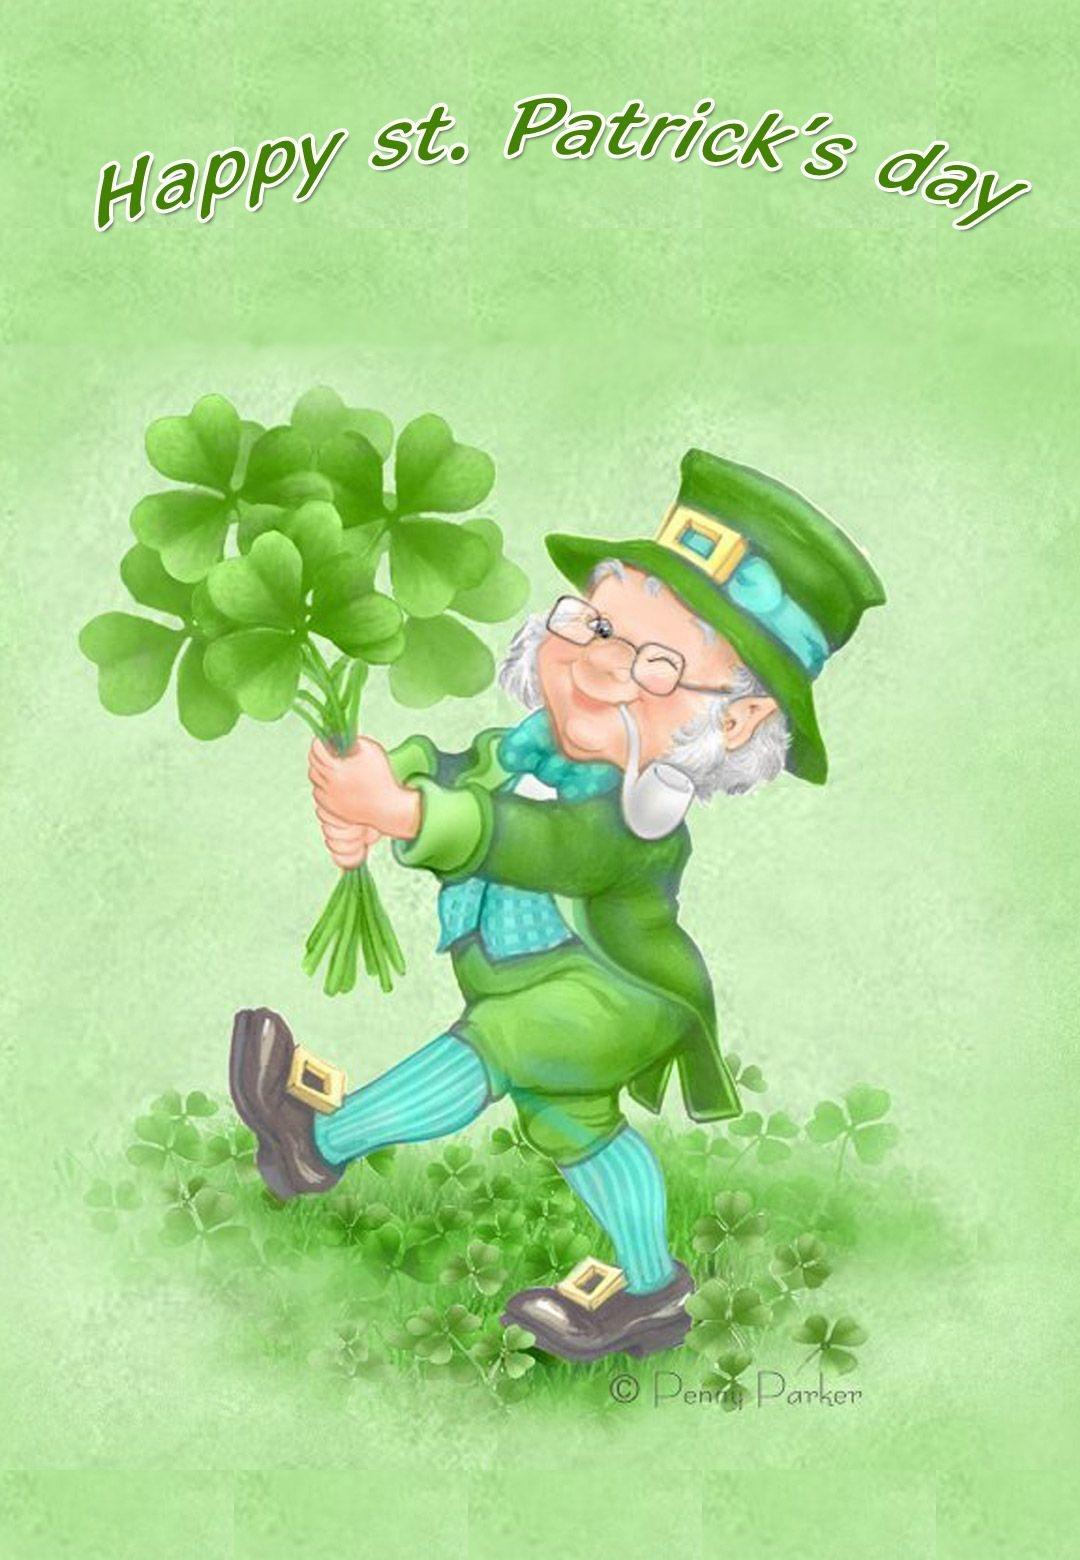 Free Printable Happy St Patricks Day Greeting Card   Printable St - Free Printable St Patrick's Day Card